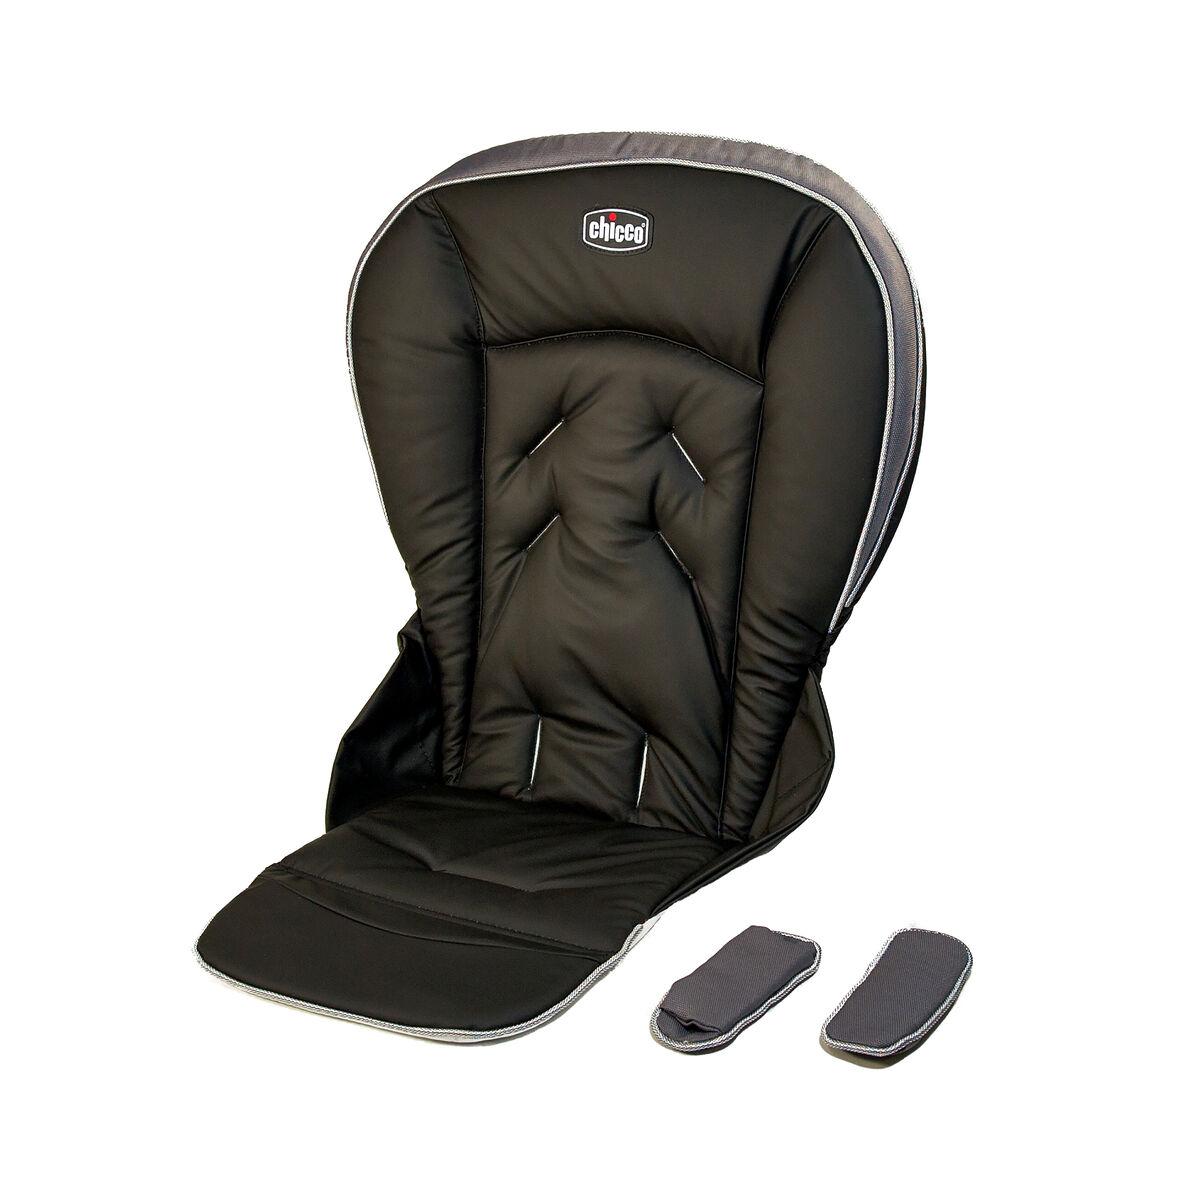 Chicco Chakra Car Seat Cover